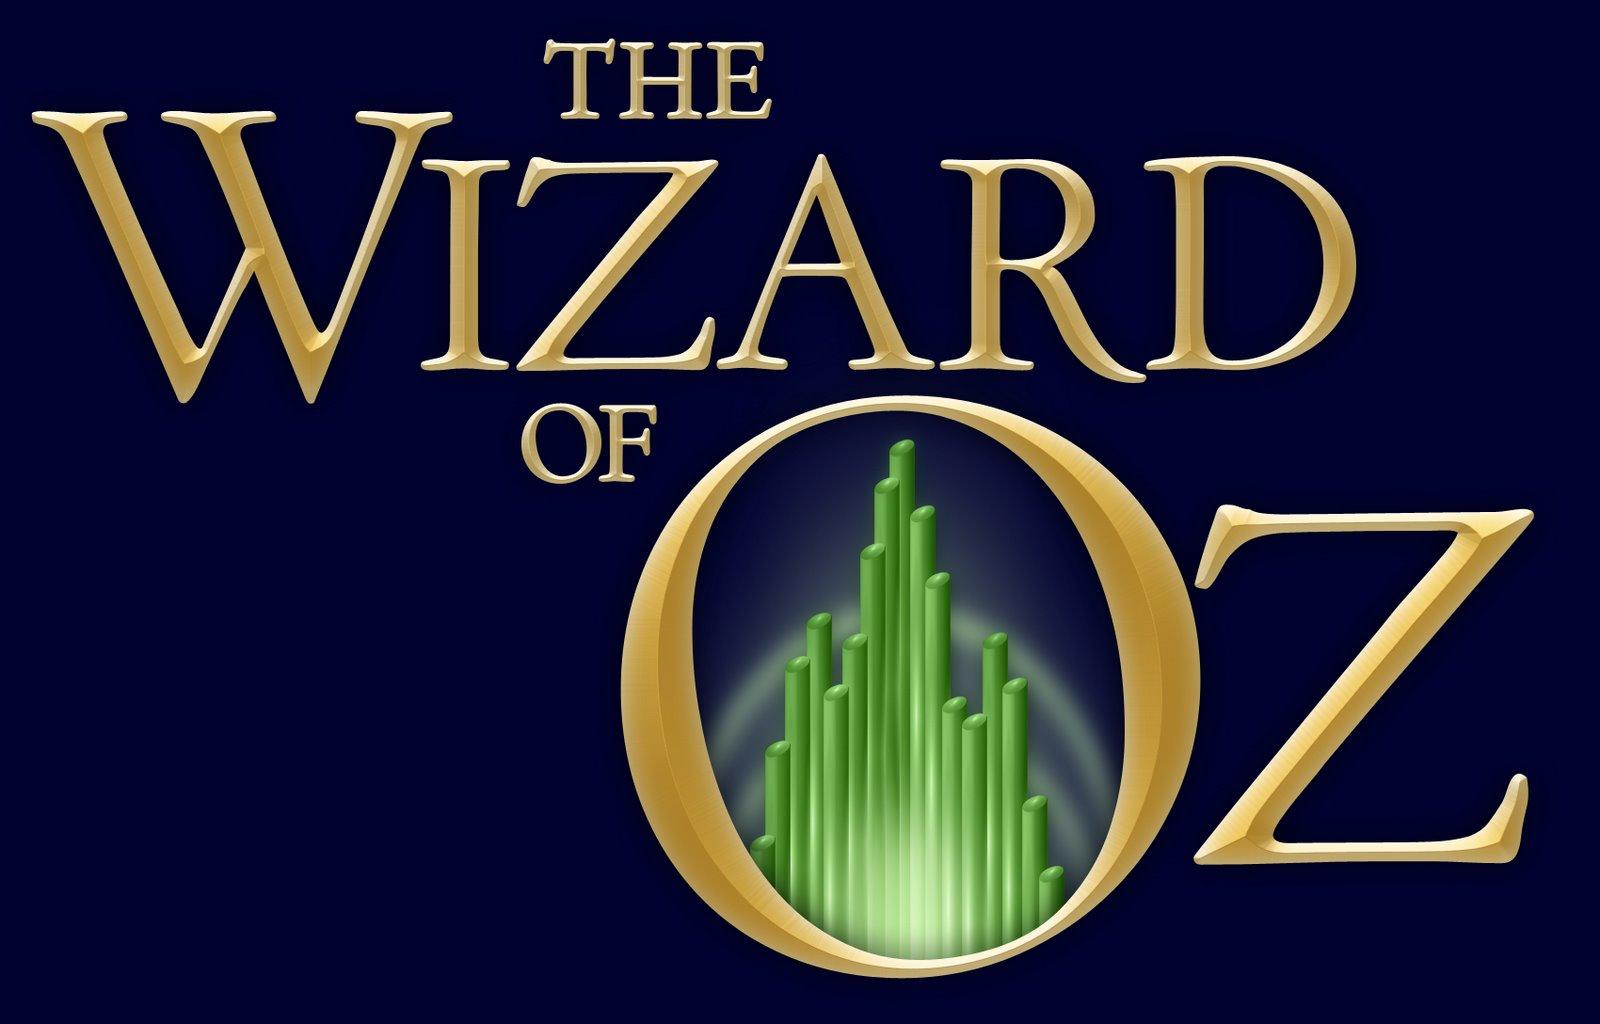 The Wozard Of Oz